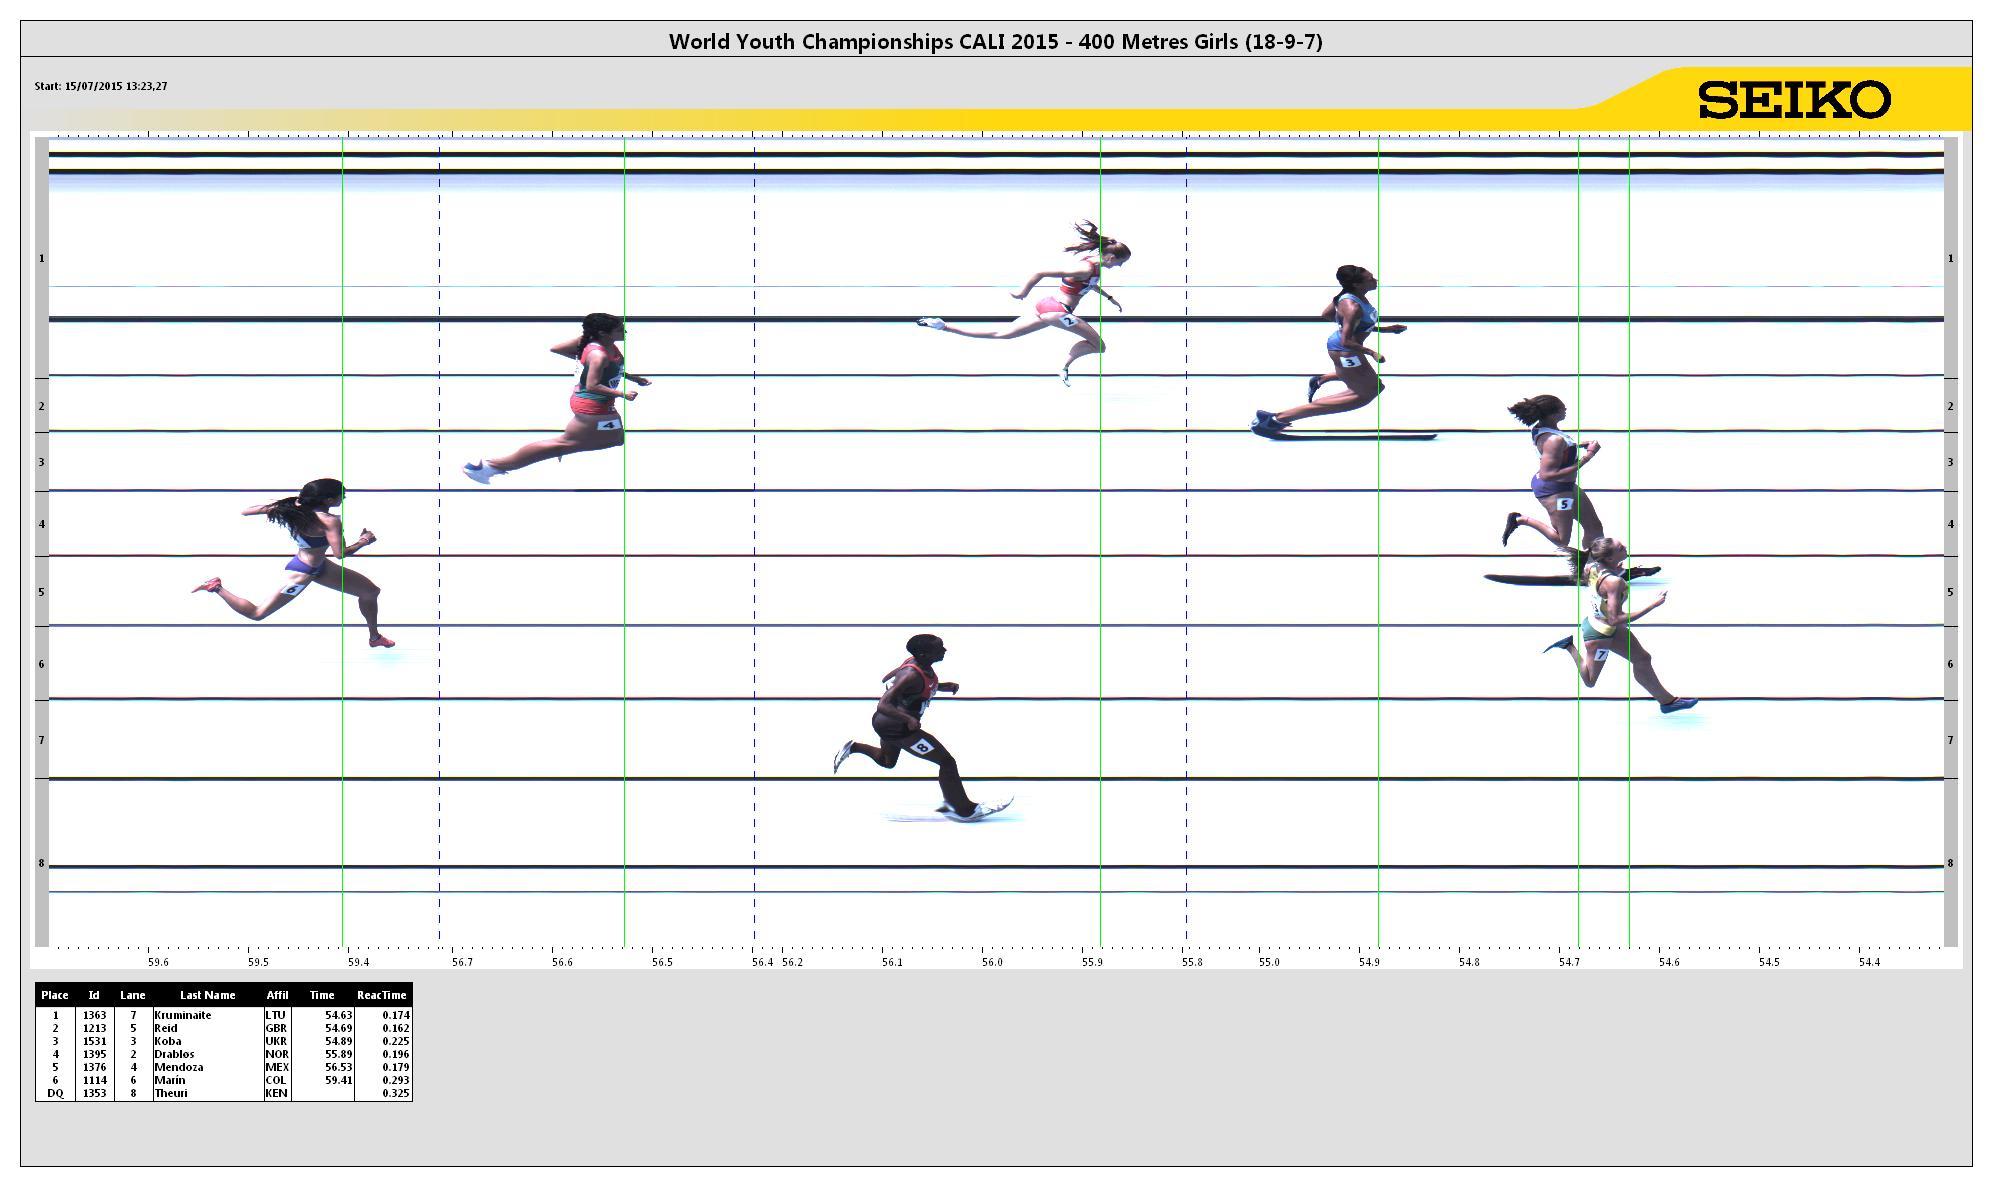 9th IAAF World Youth Championships